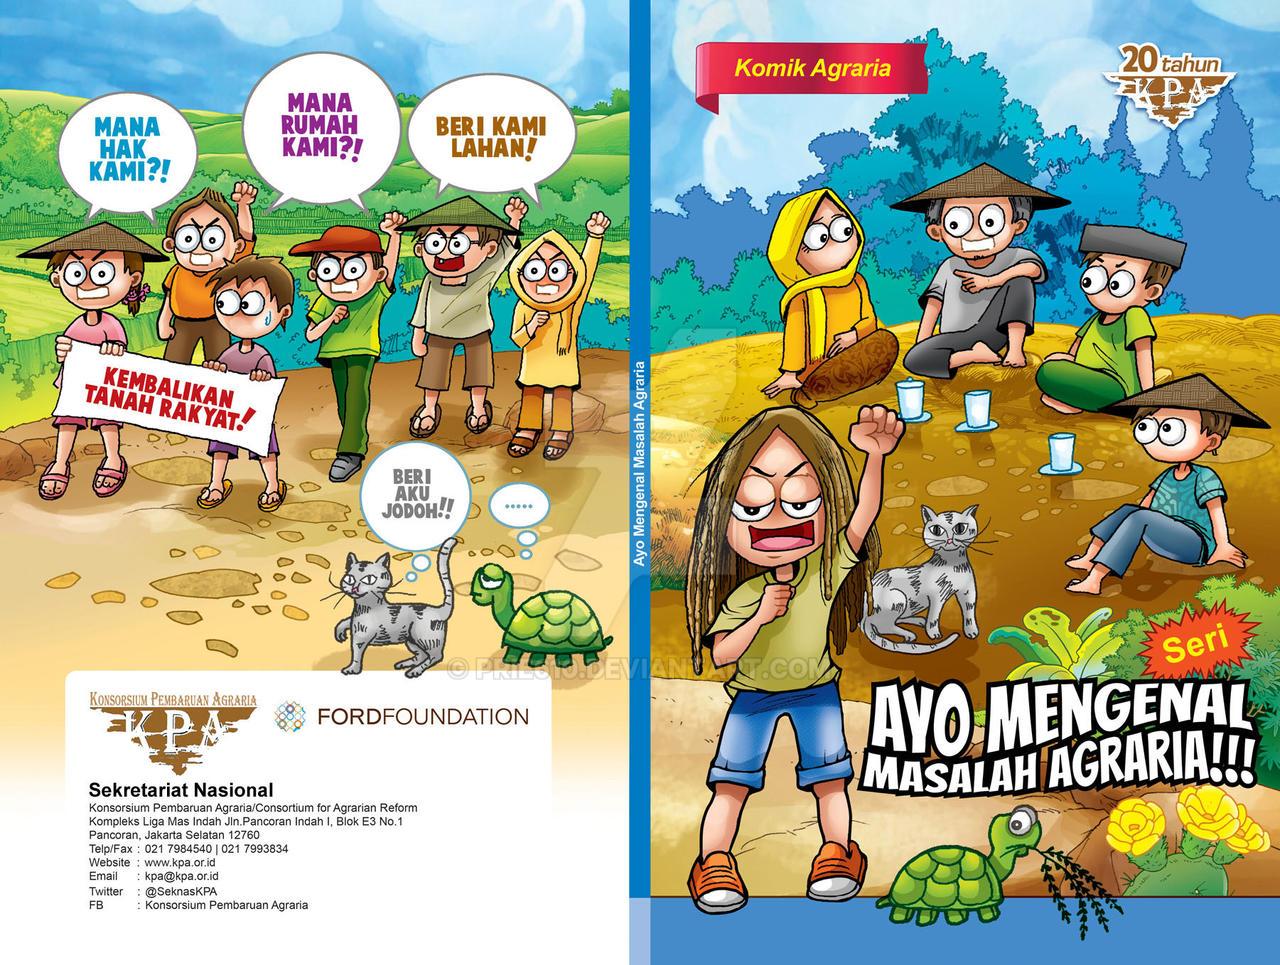 Cover Komik Agraria by prie610